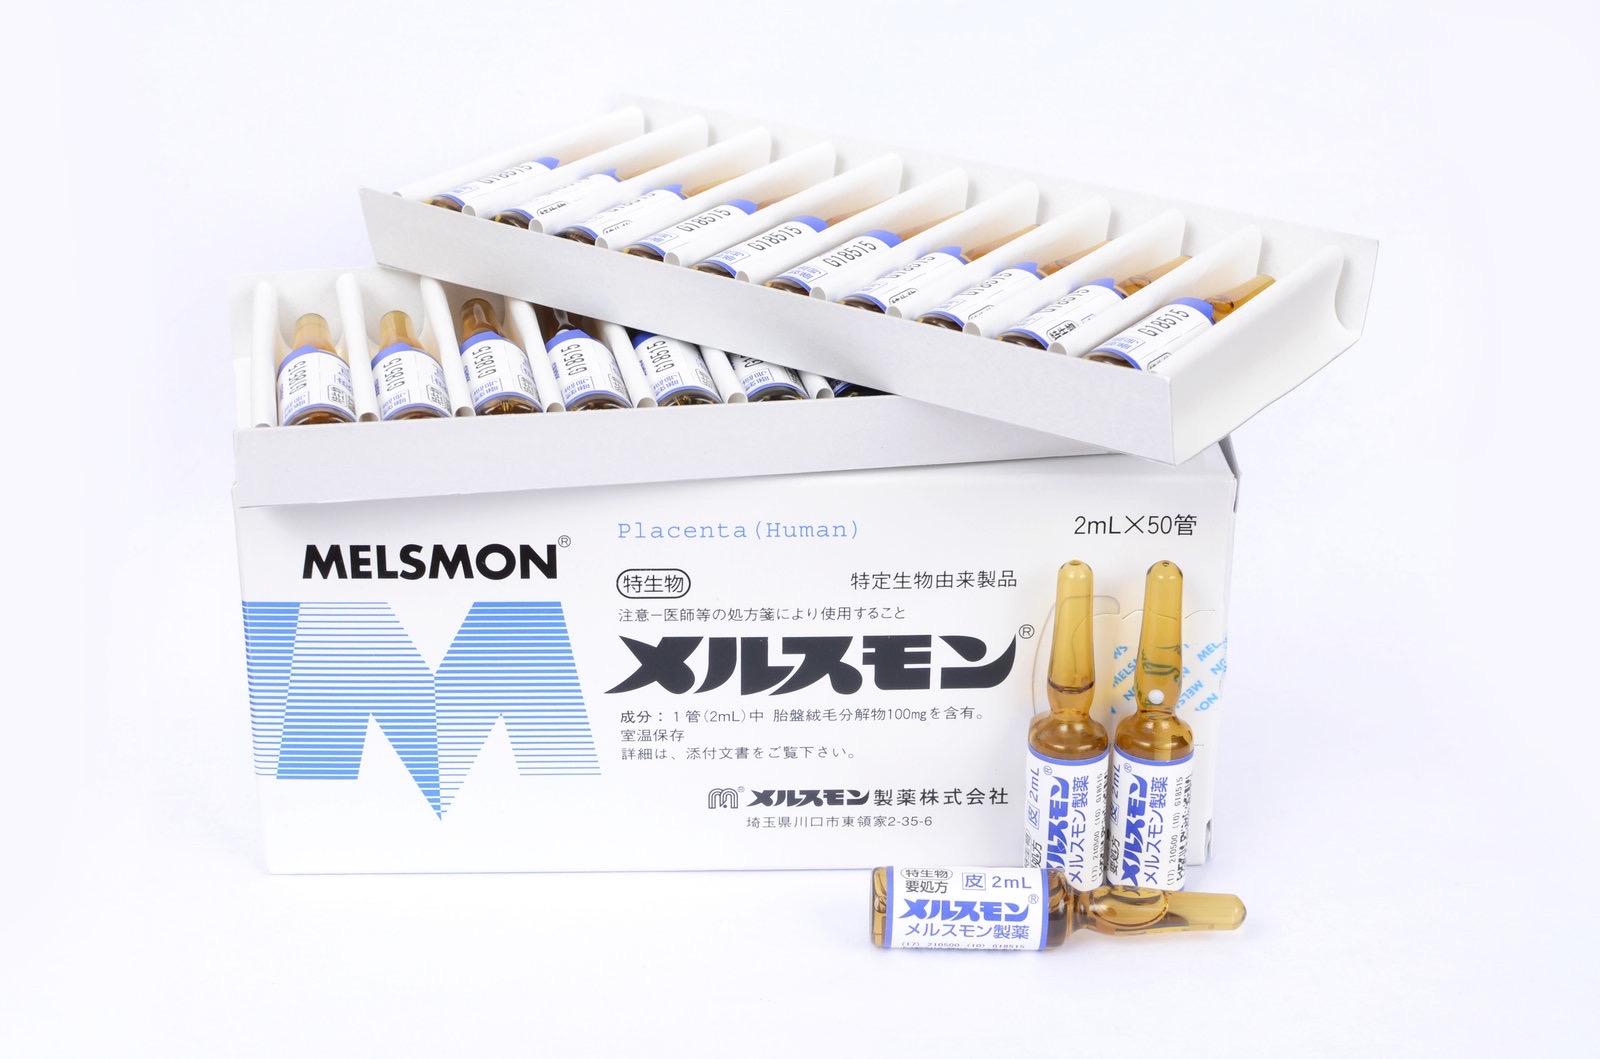 Плацентарные препараты Laennec и Melsmon, Япония